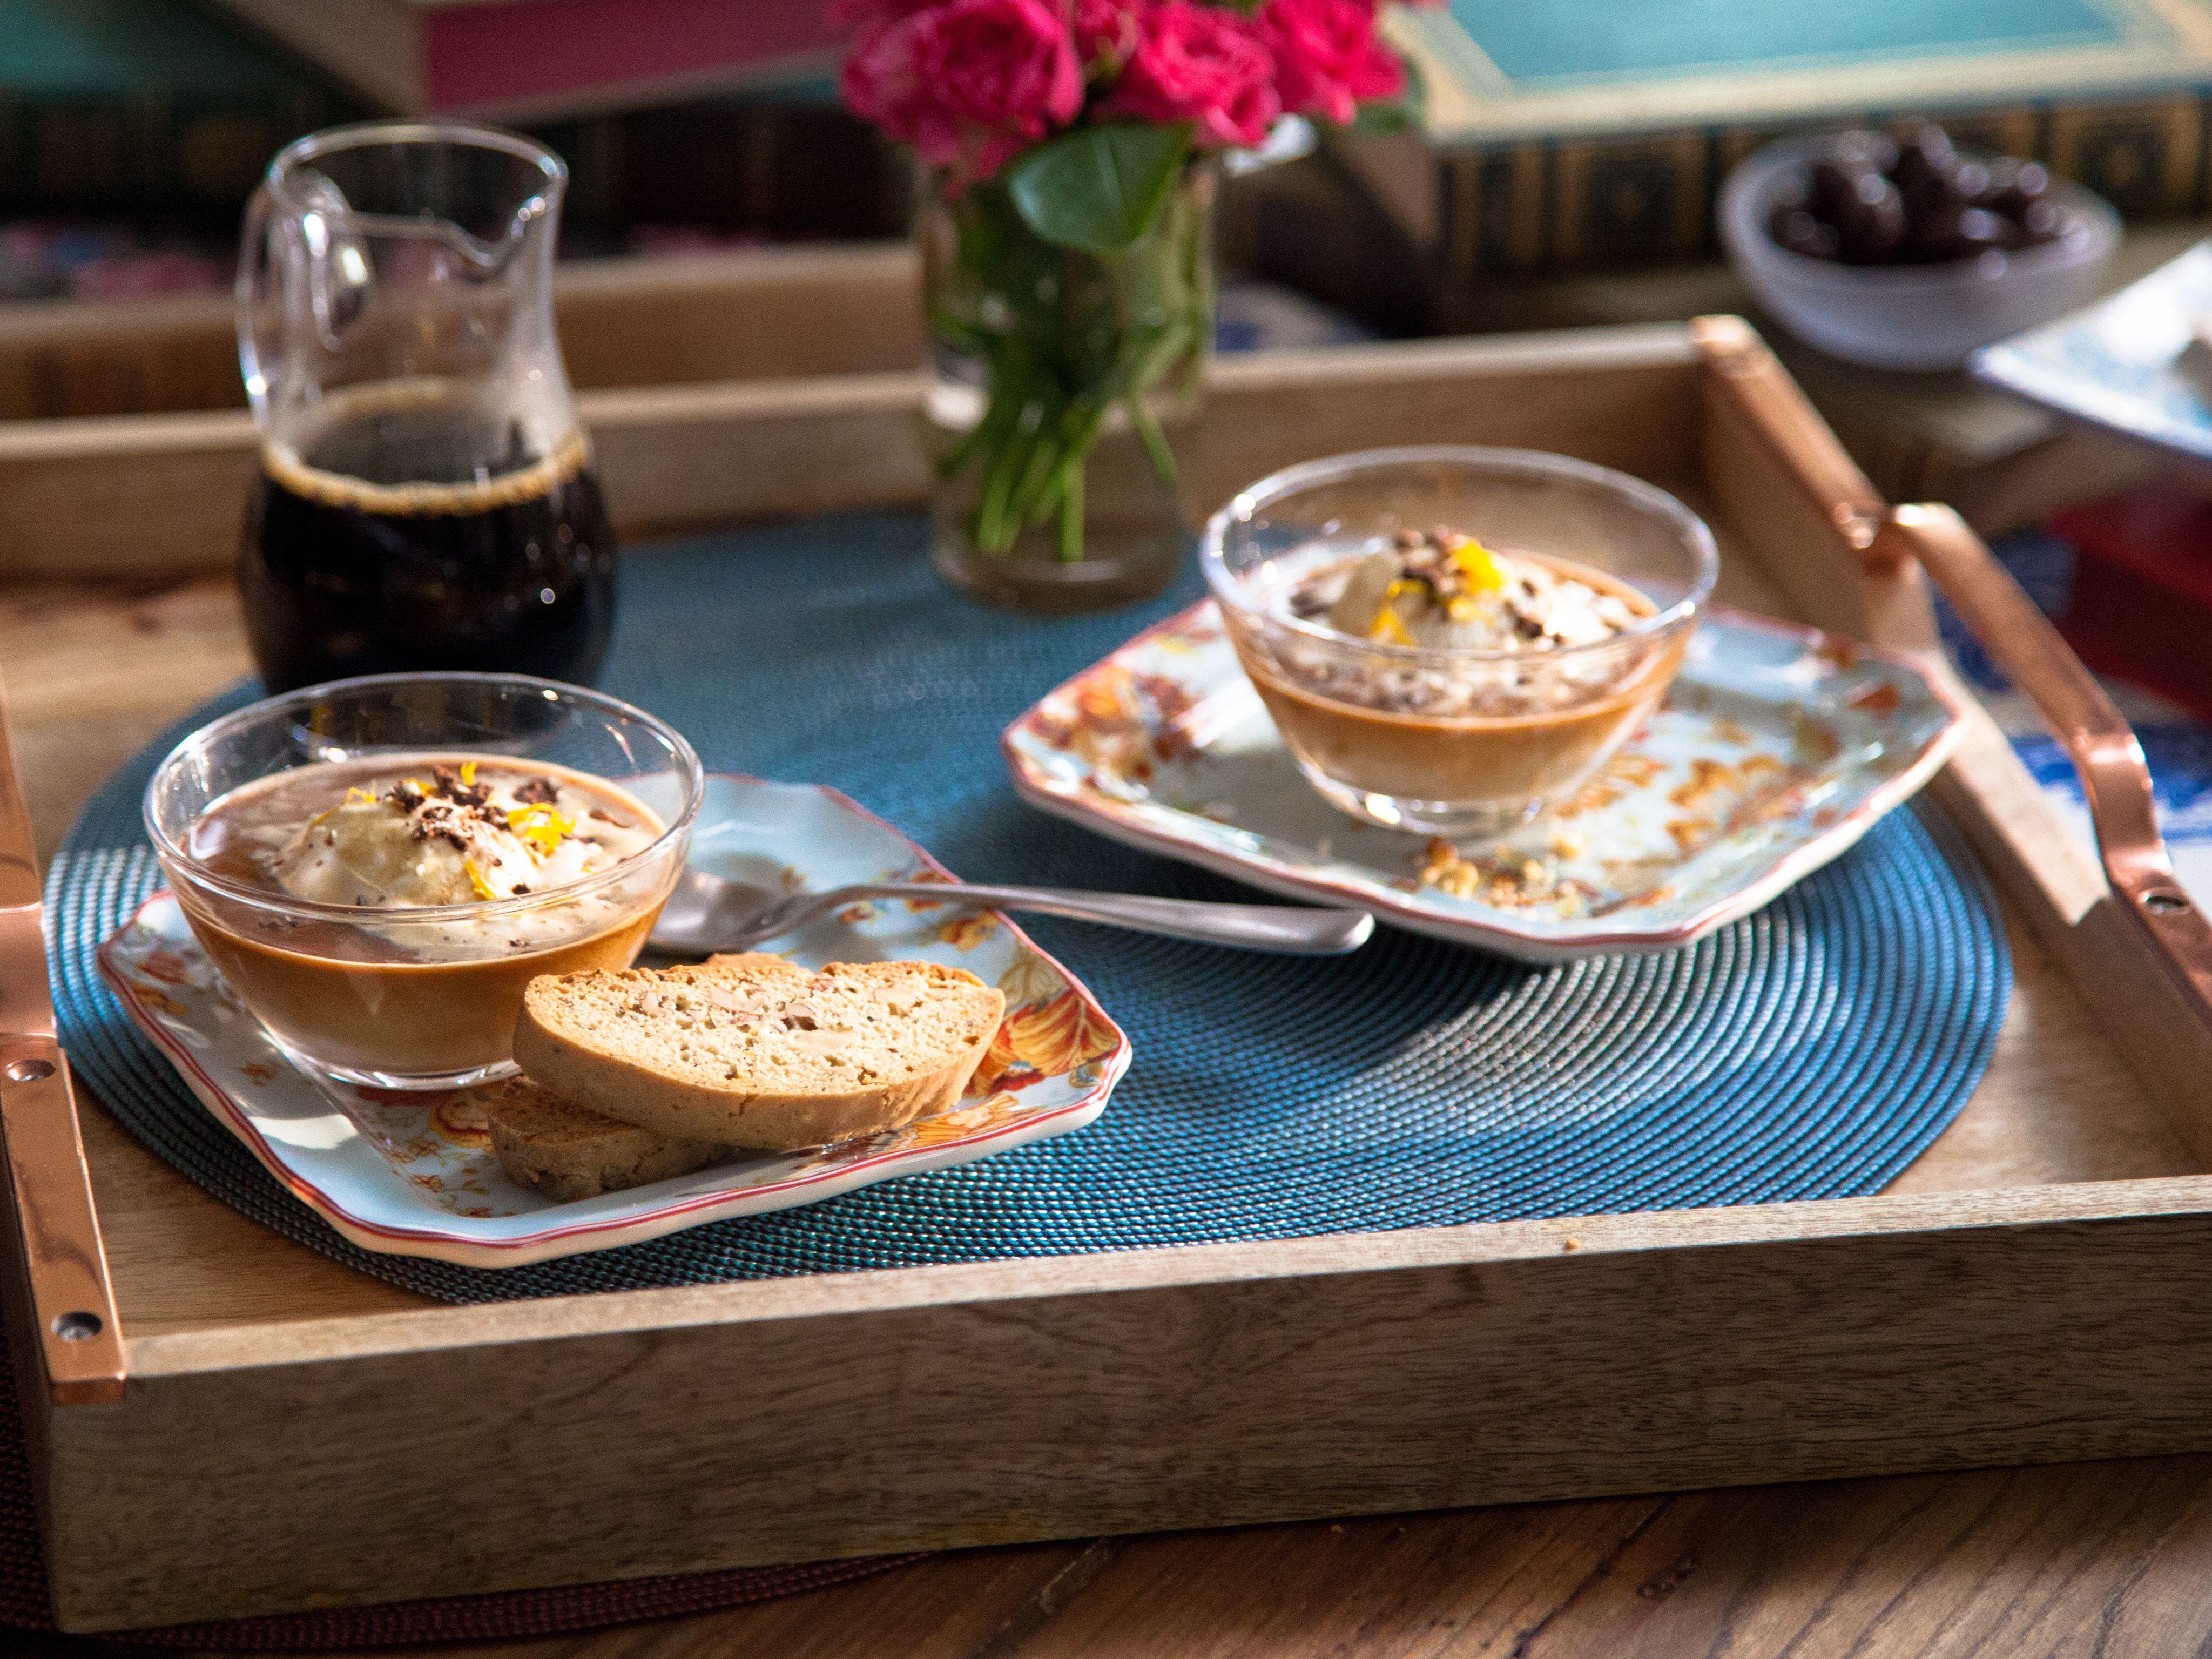 Helen's Black Pepper Walnut Biscotti recipe from Valerie Bertinelli via Food Network